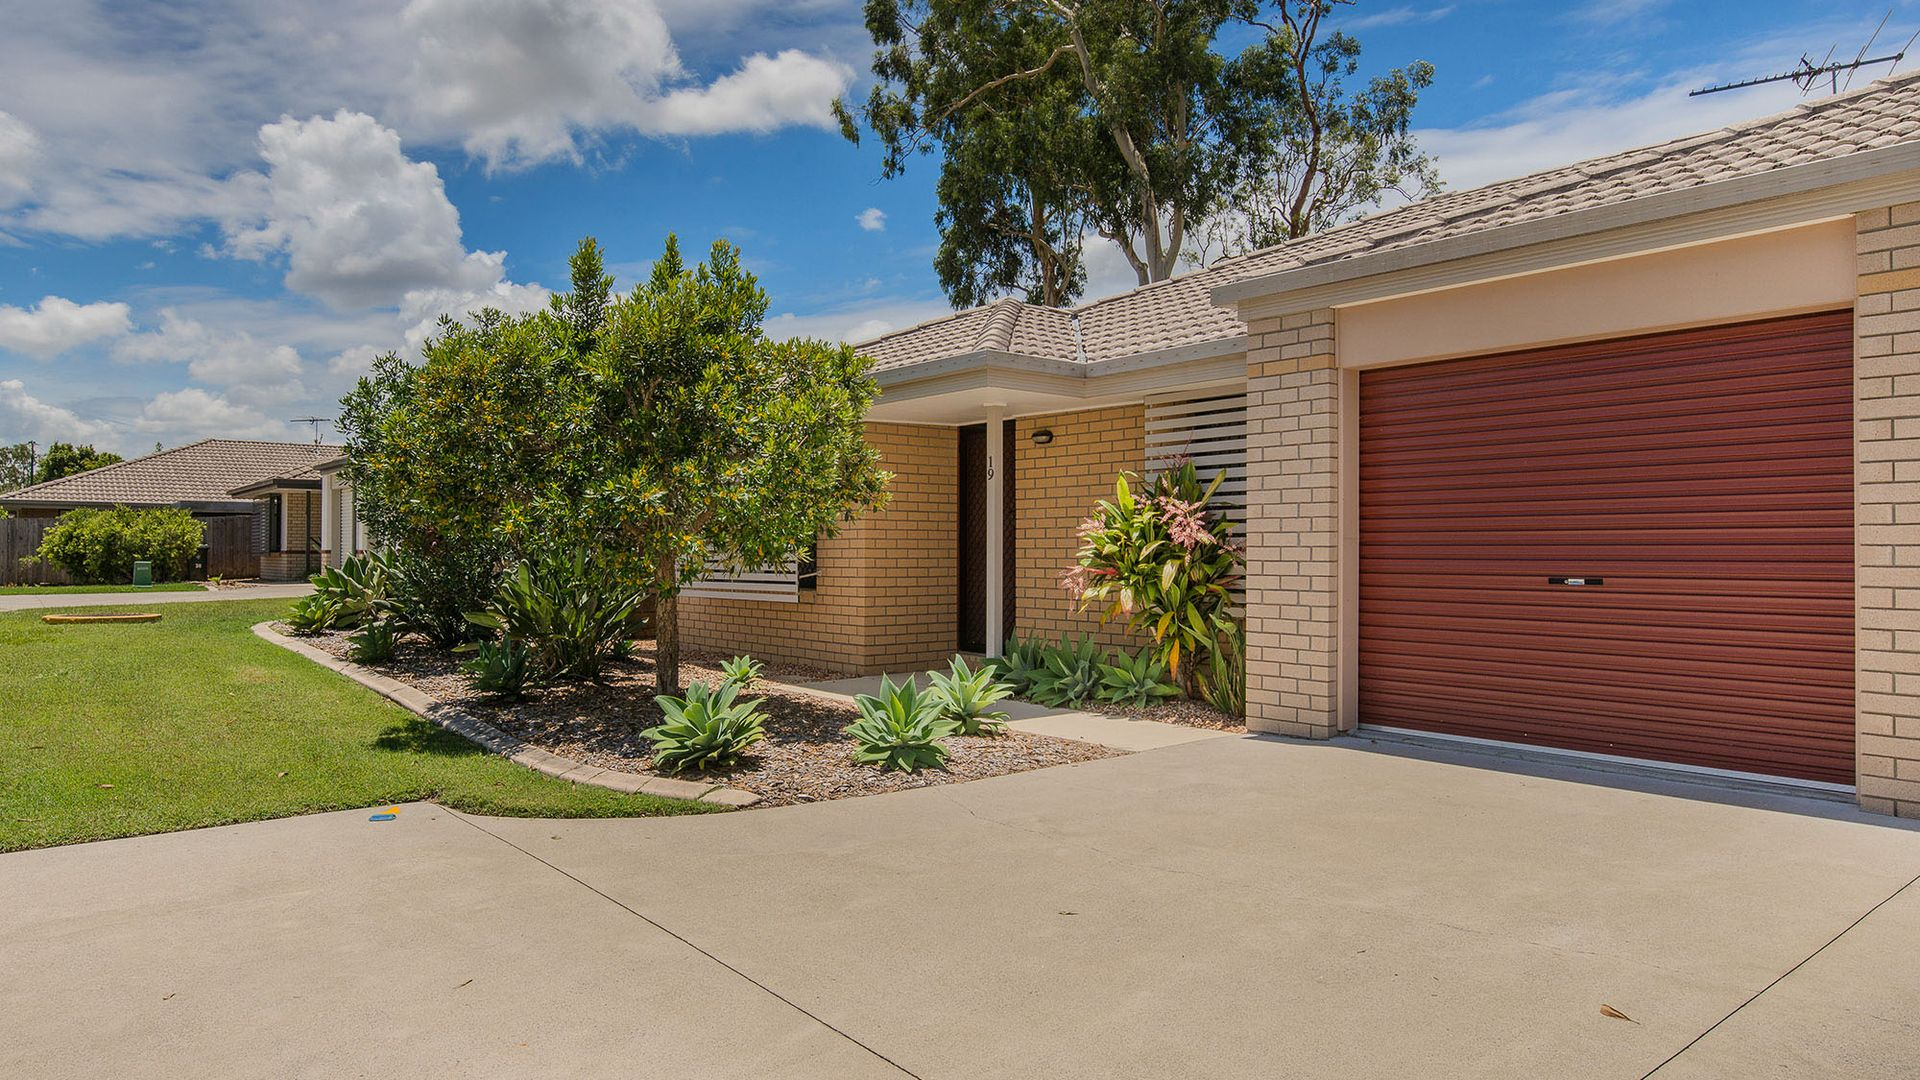 19/20 Neiwand Street, Calamvale QLD 4116, Image 8